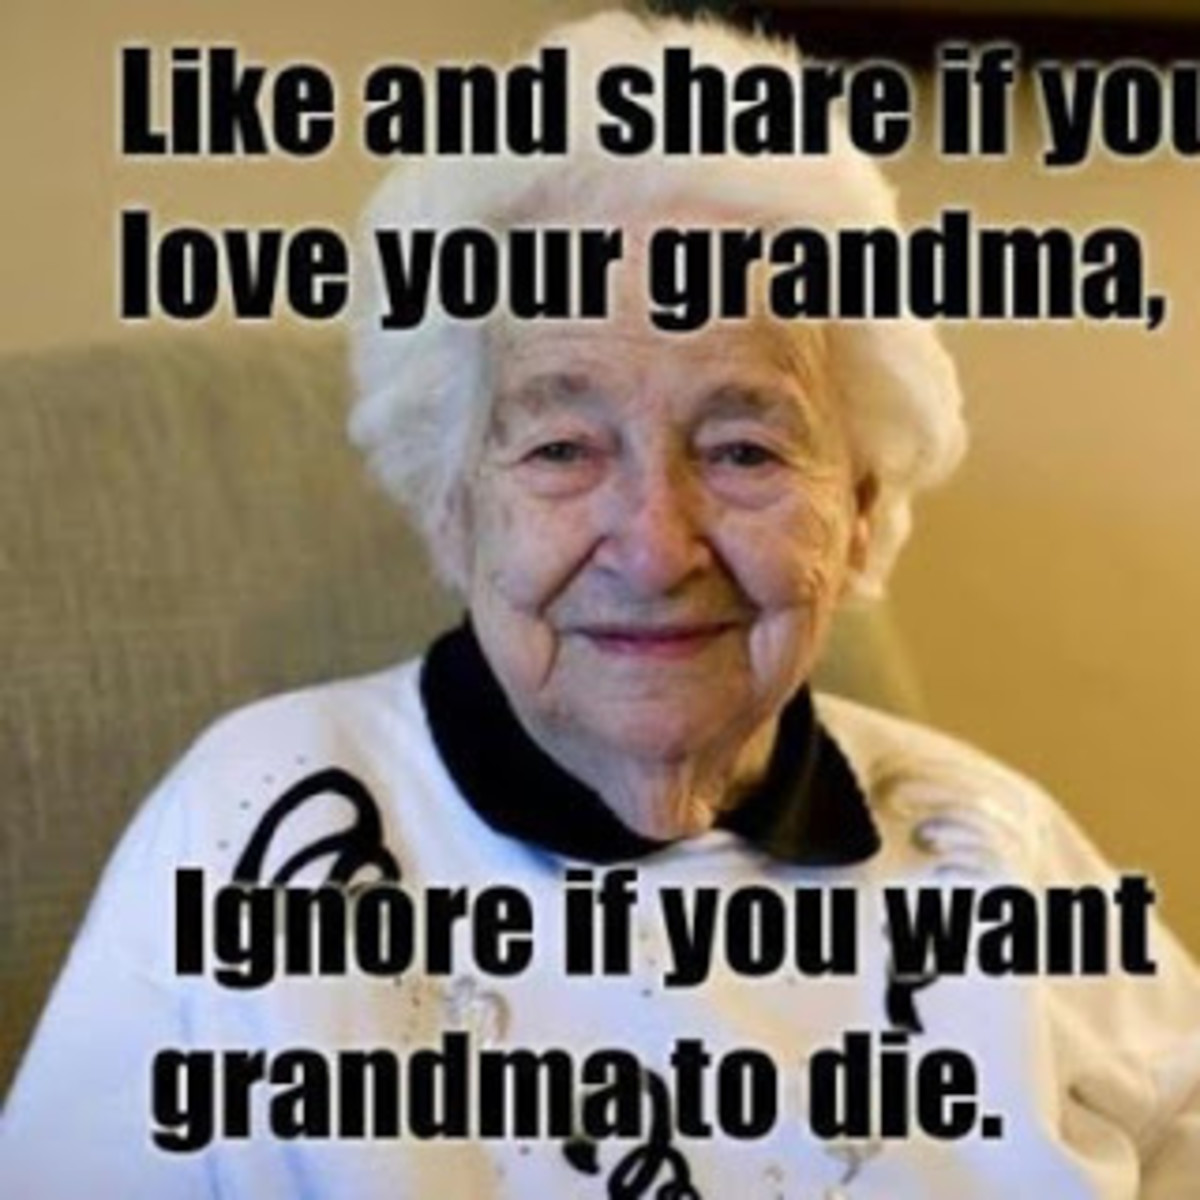 Sorry Granny, I guess I hate you.